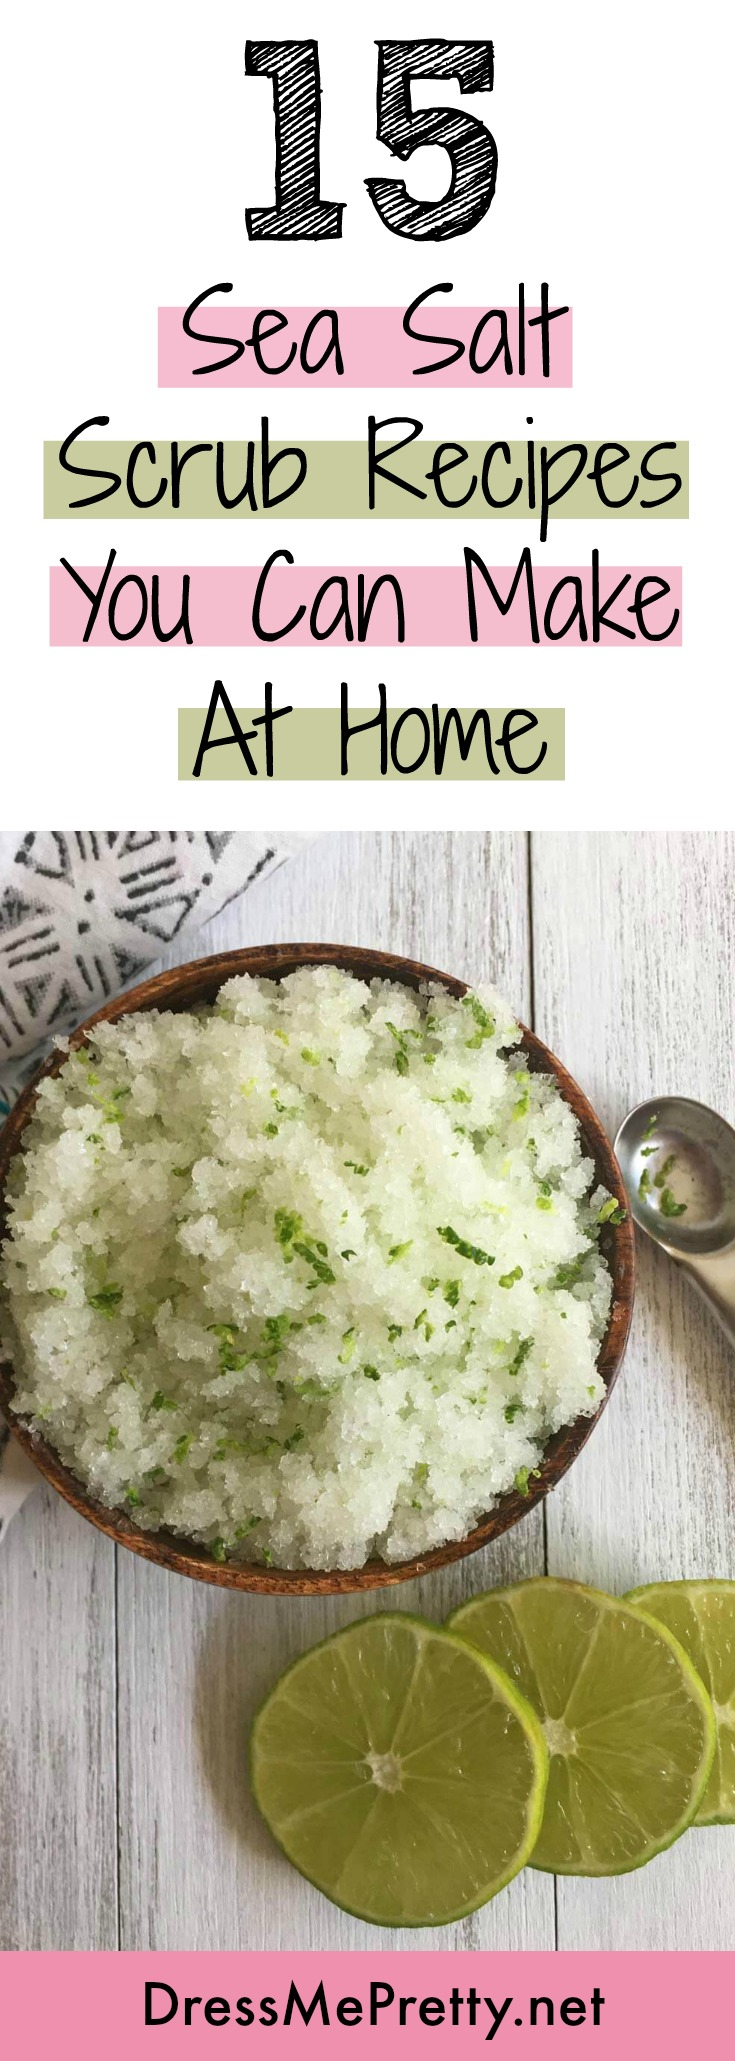 Sea Salt Scrub Recipes